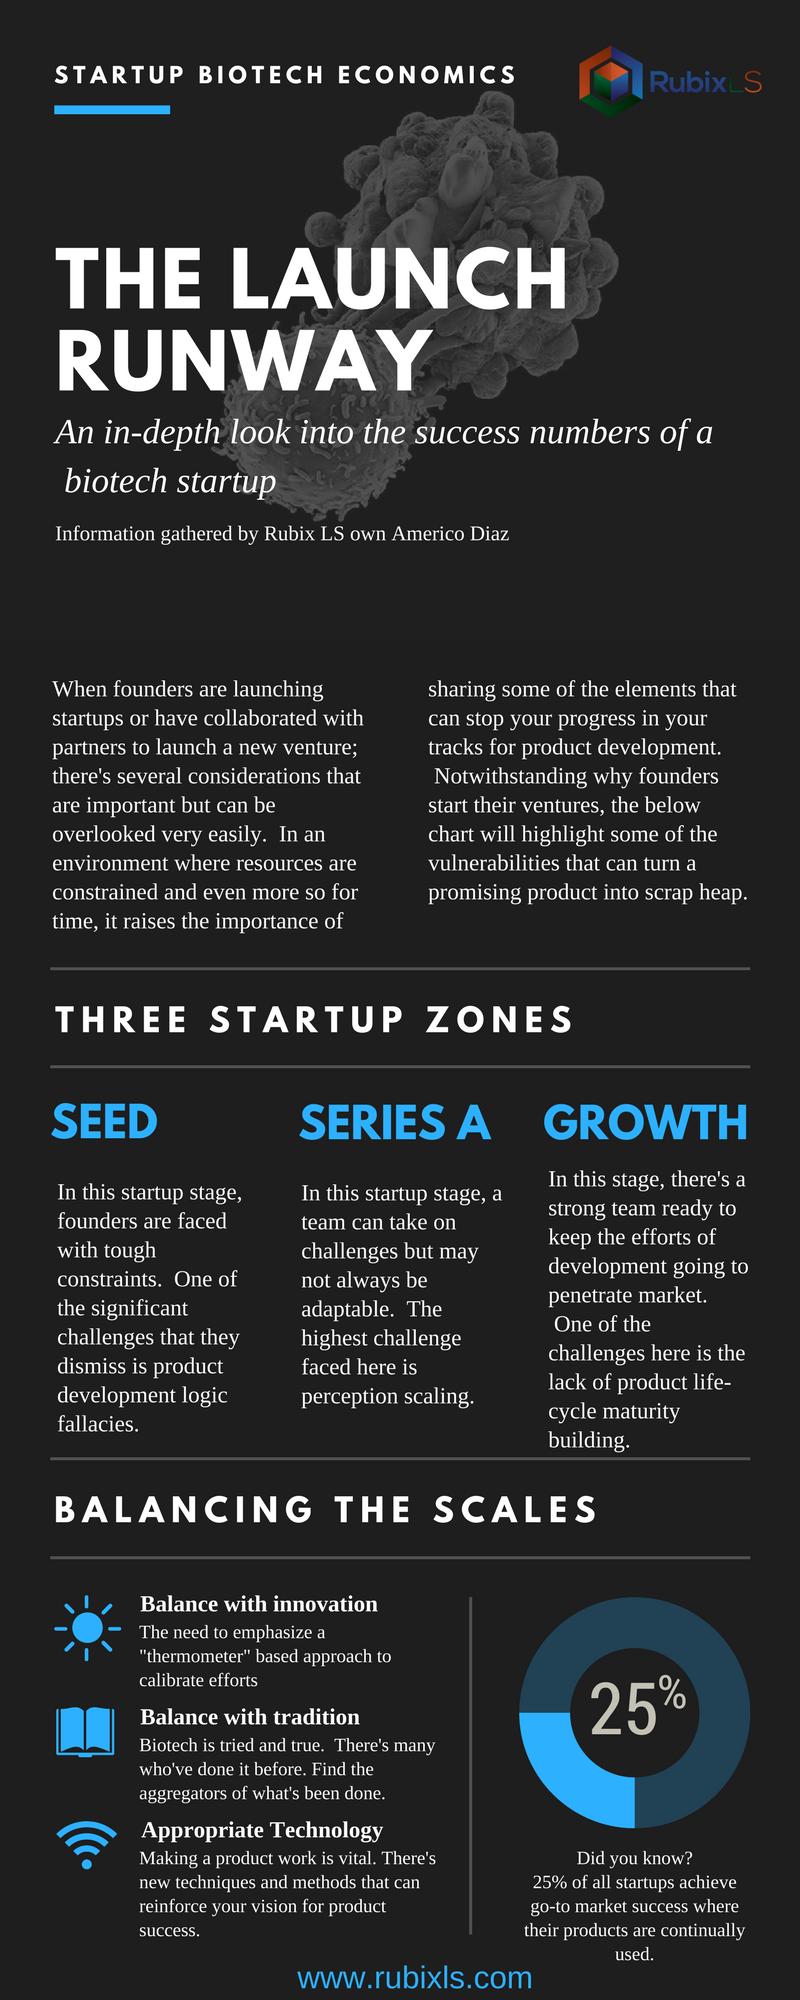 Startup Biotech economics (2).png